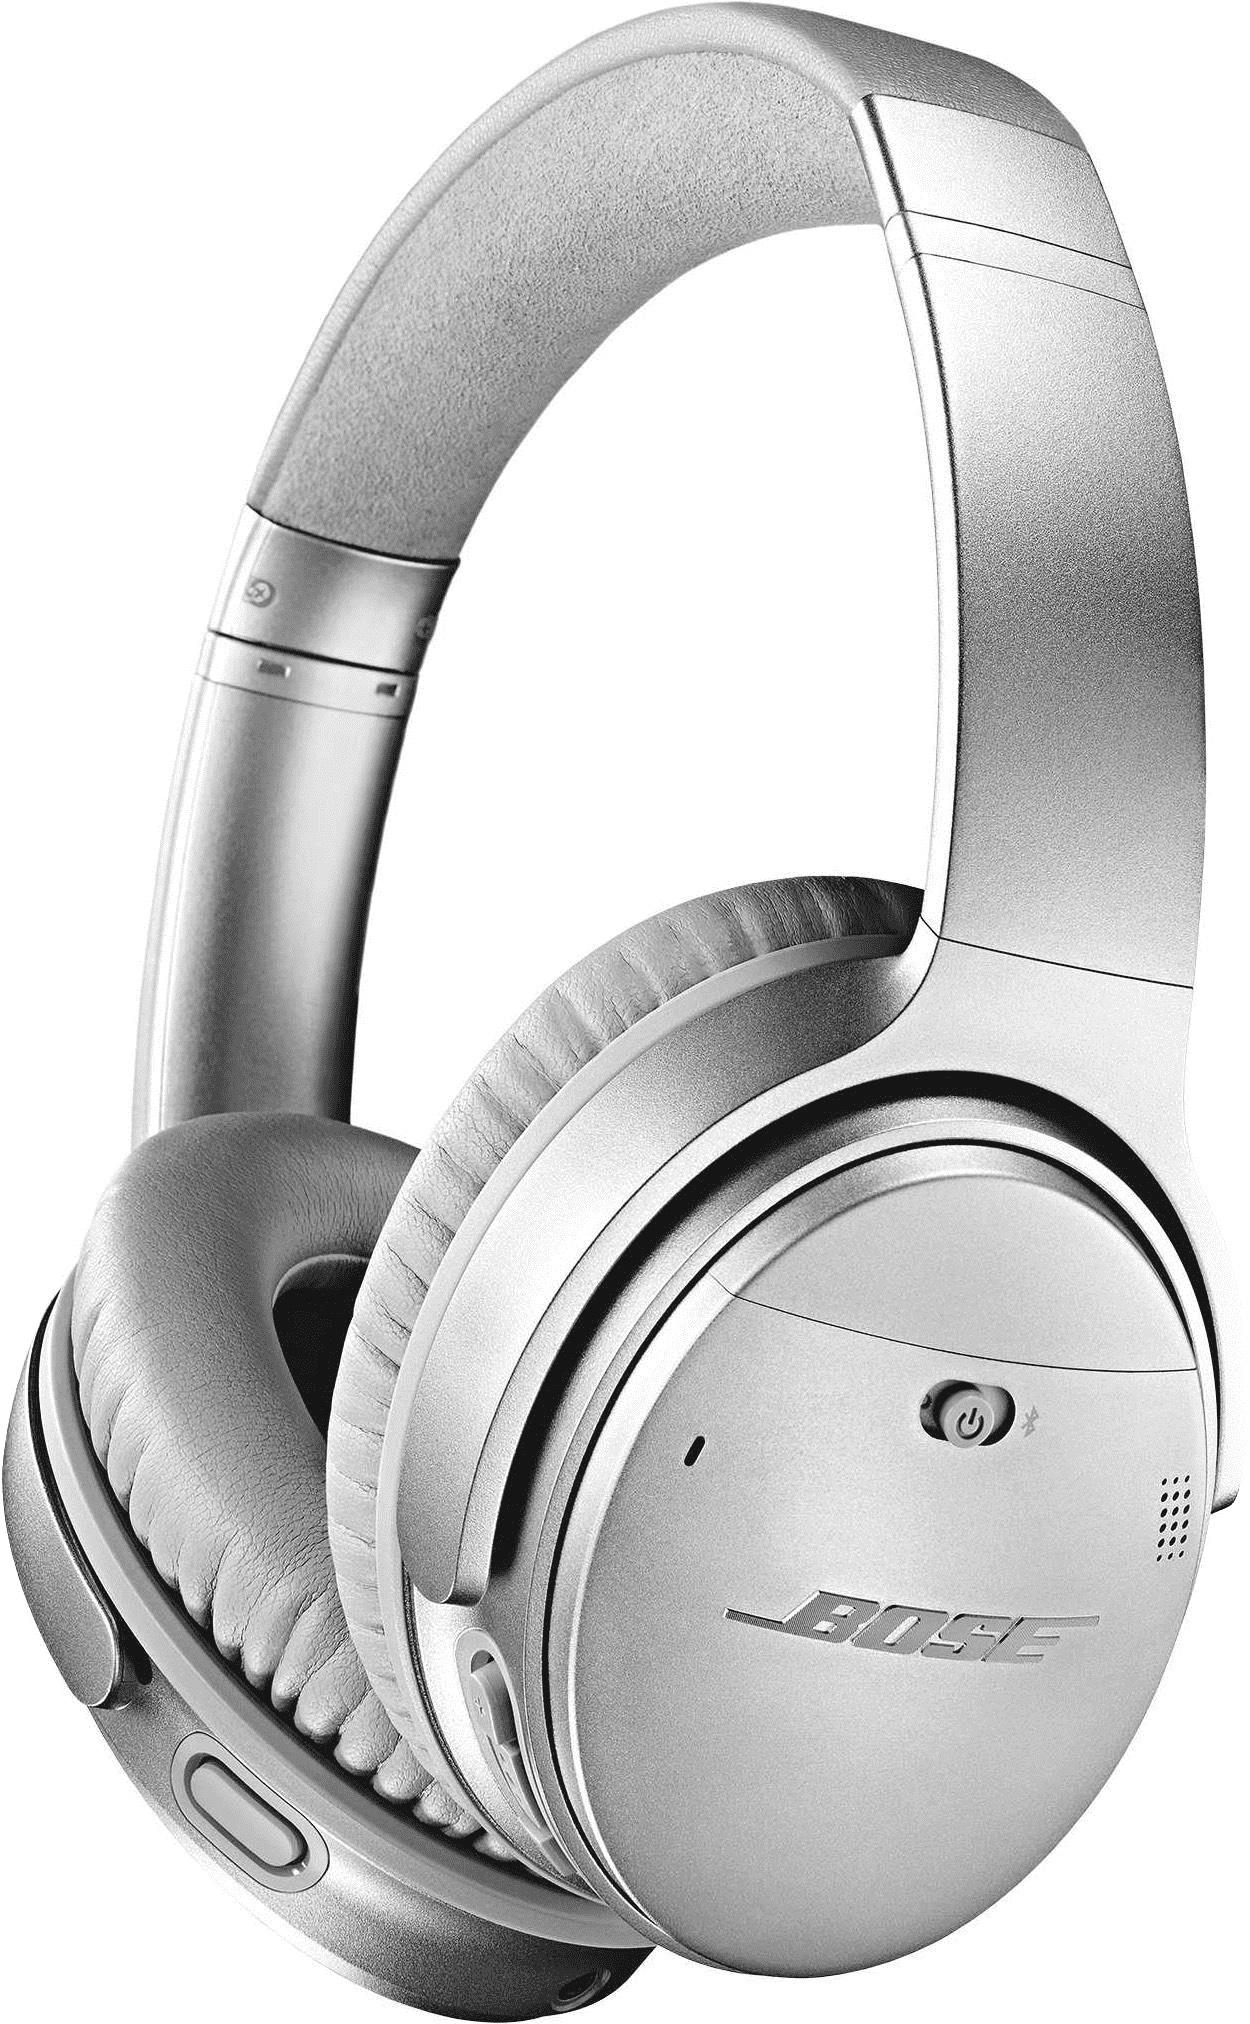 BOSE Quietcomfort 35 II QC35II Over Ear silber Noise Cancelling Wireless Kopfhörer für 169,89 EUR (Newsletter)